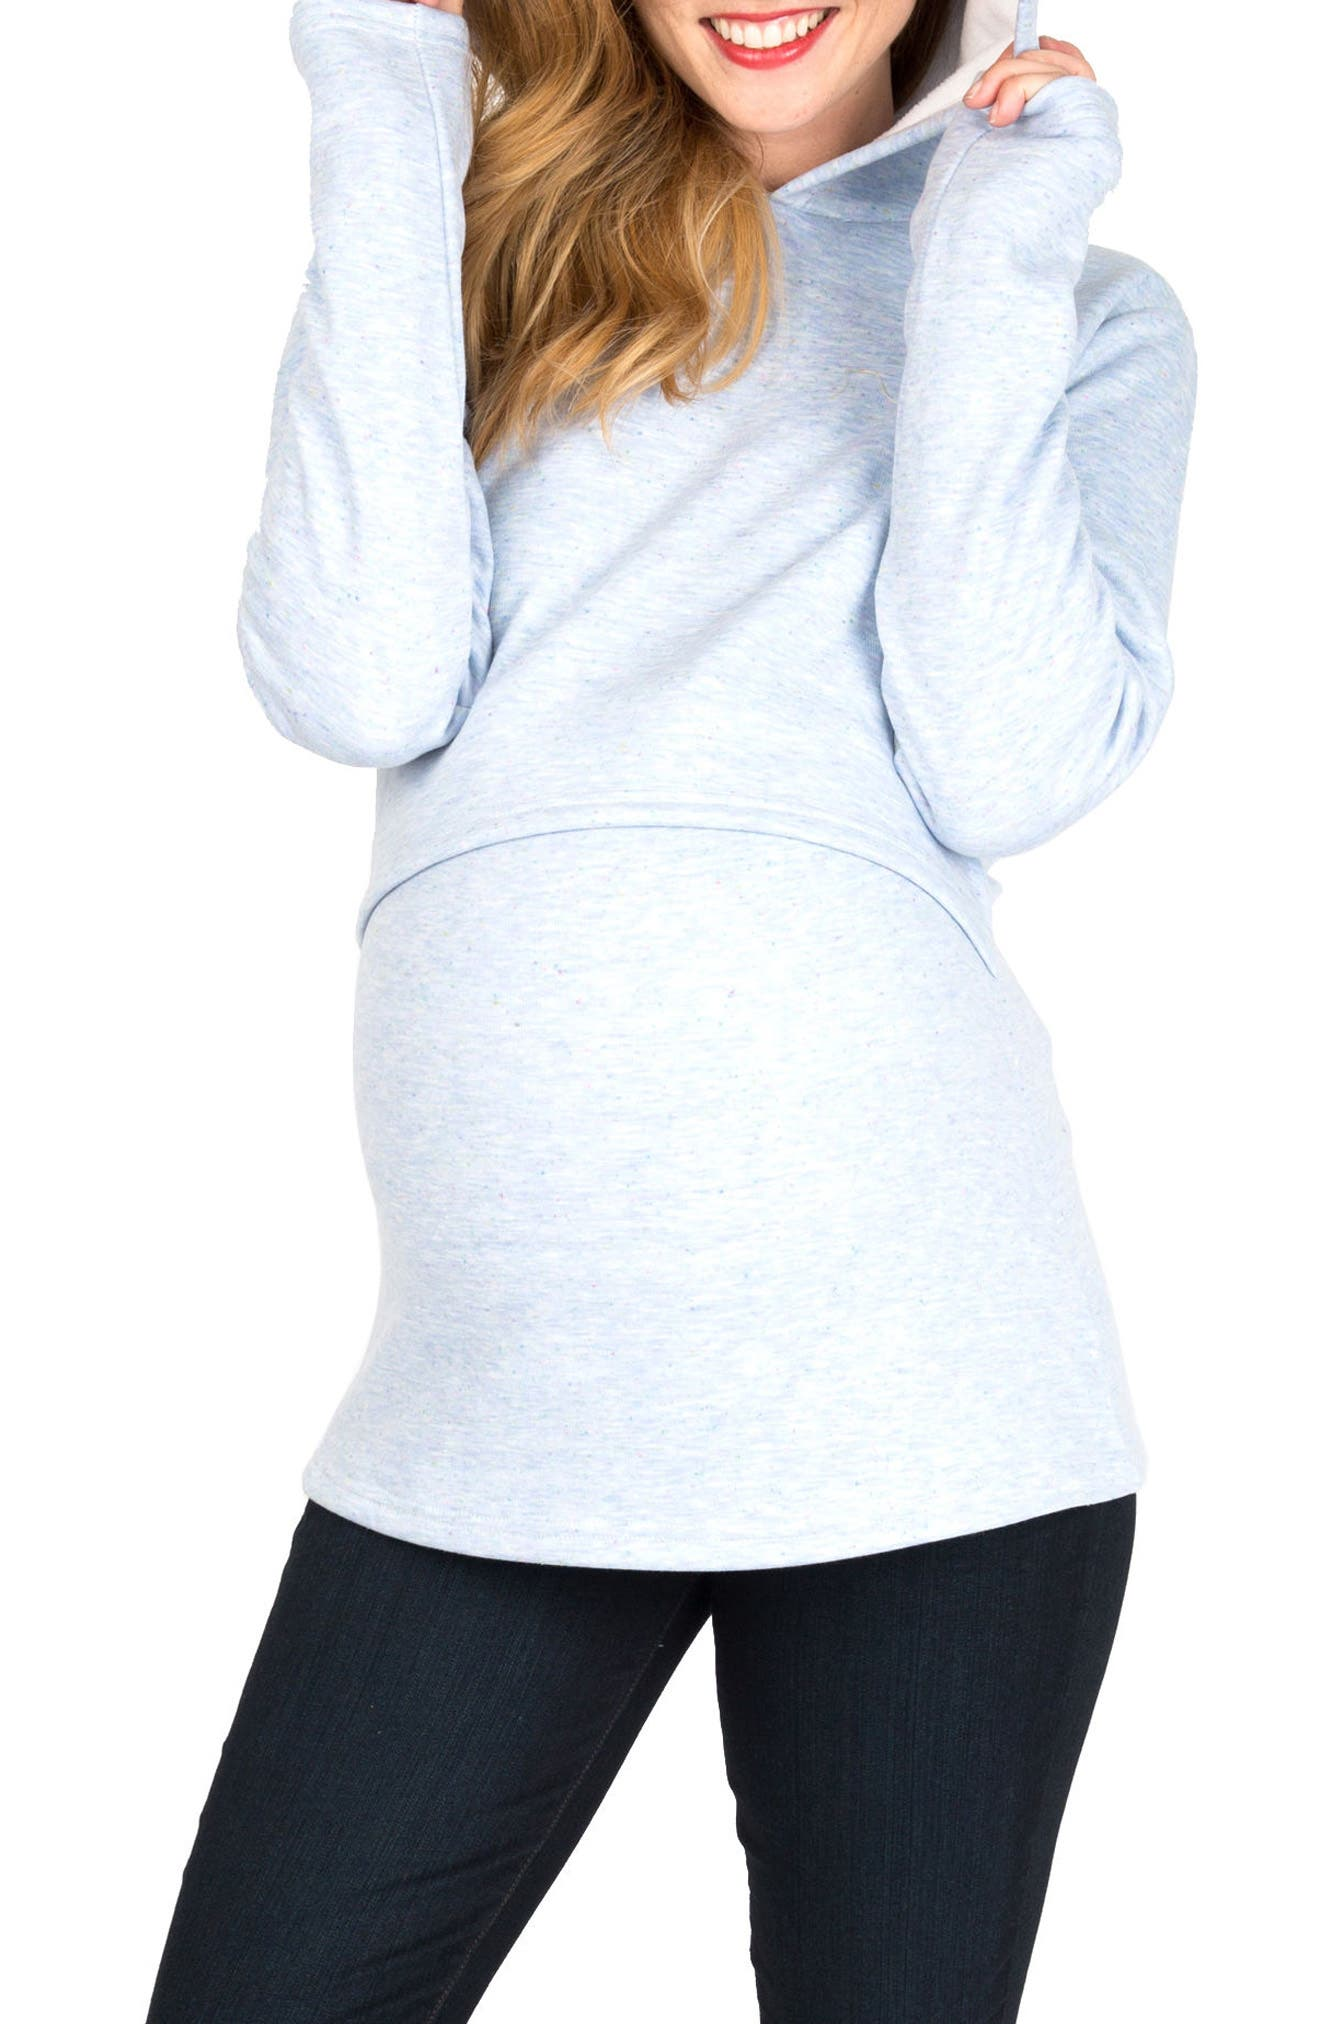 Alternate Image 1 Selected - Nom Maternity Rory Maternity/Nursing Hoodie